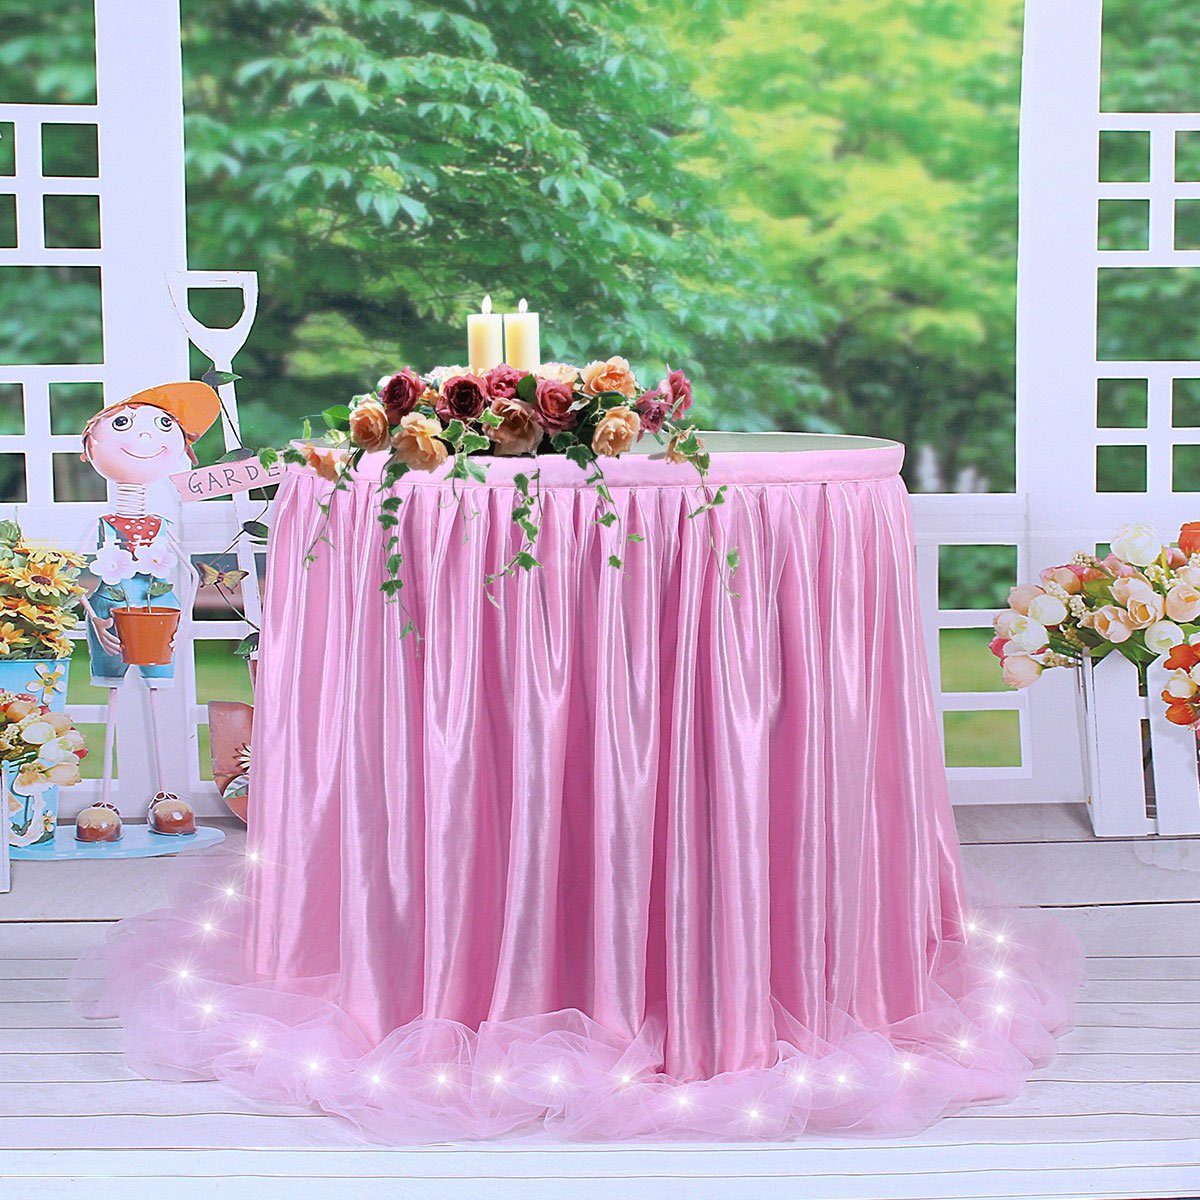 Amazon.com: LED Table Skirt 6ft Pink Tulle Table Skirt Tutu Table ...